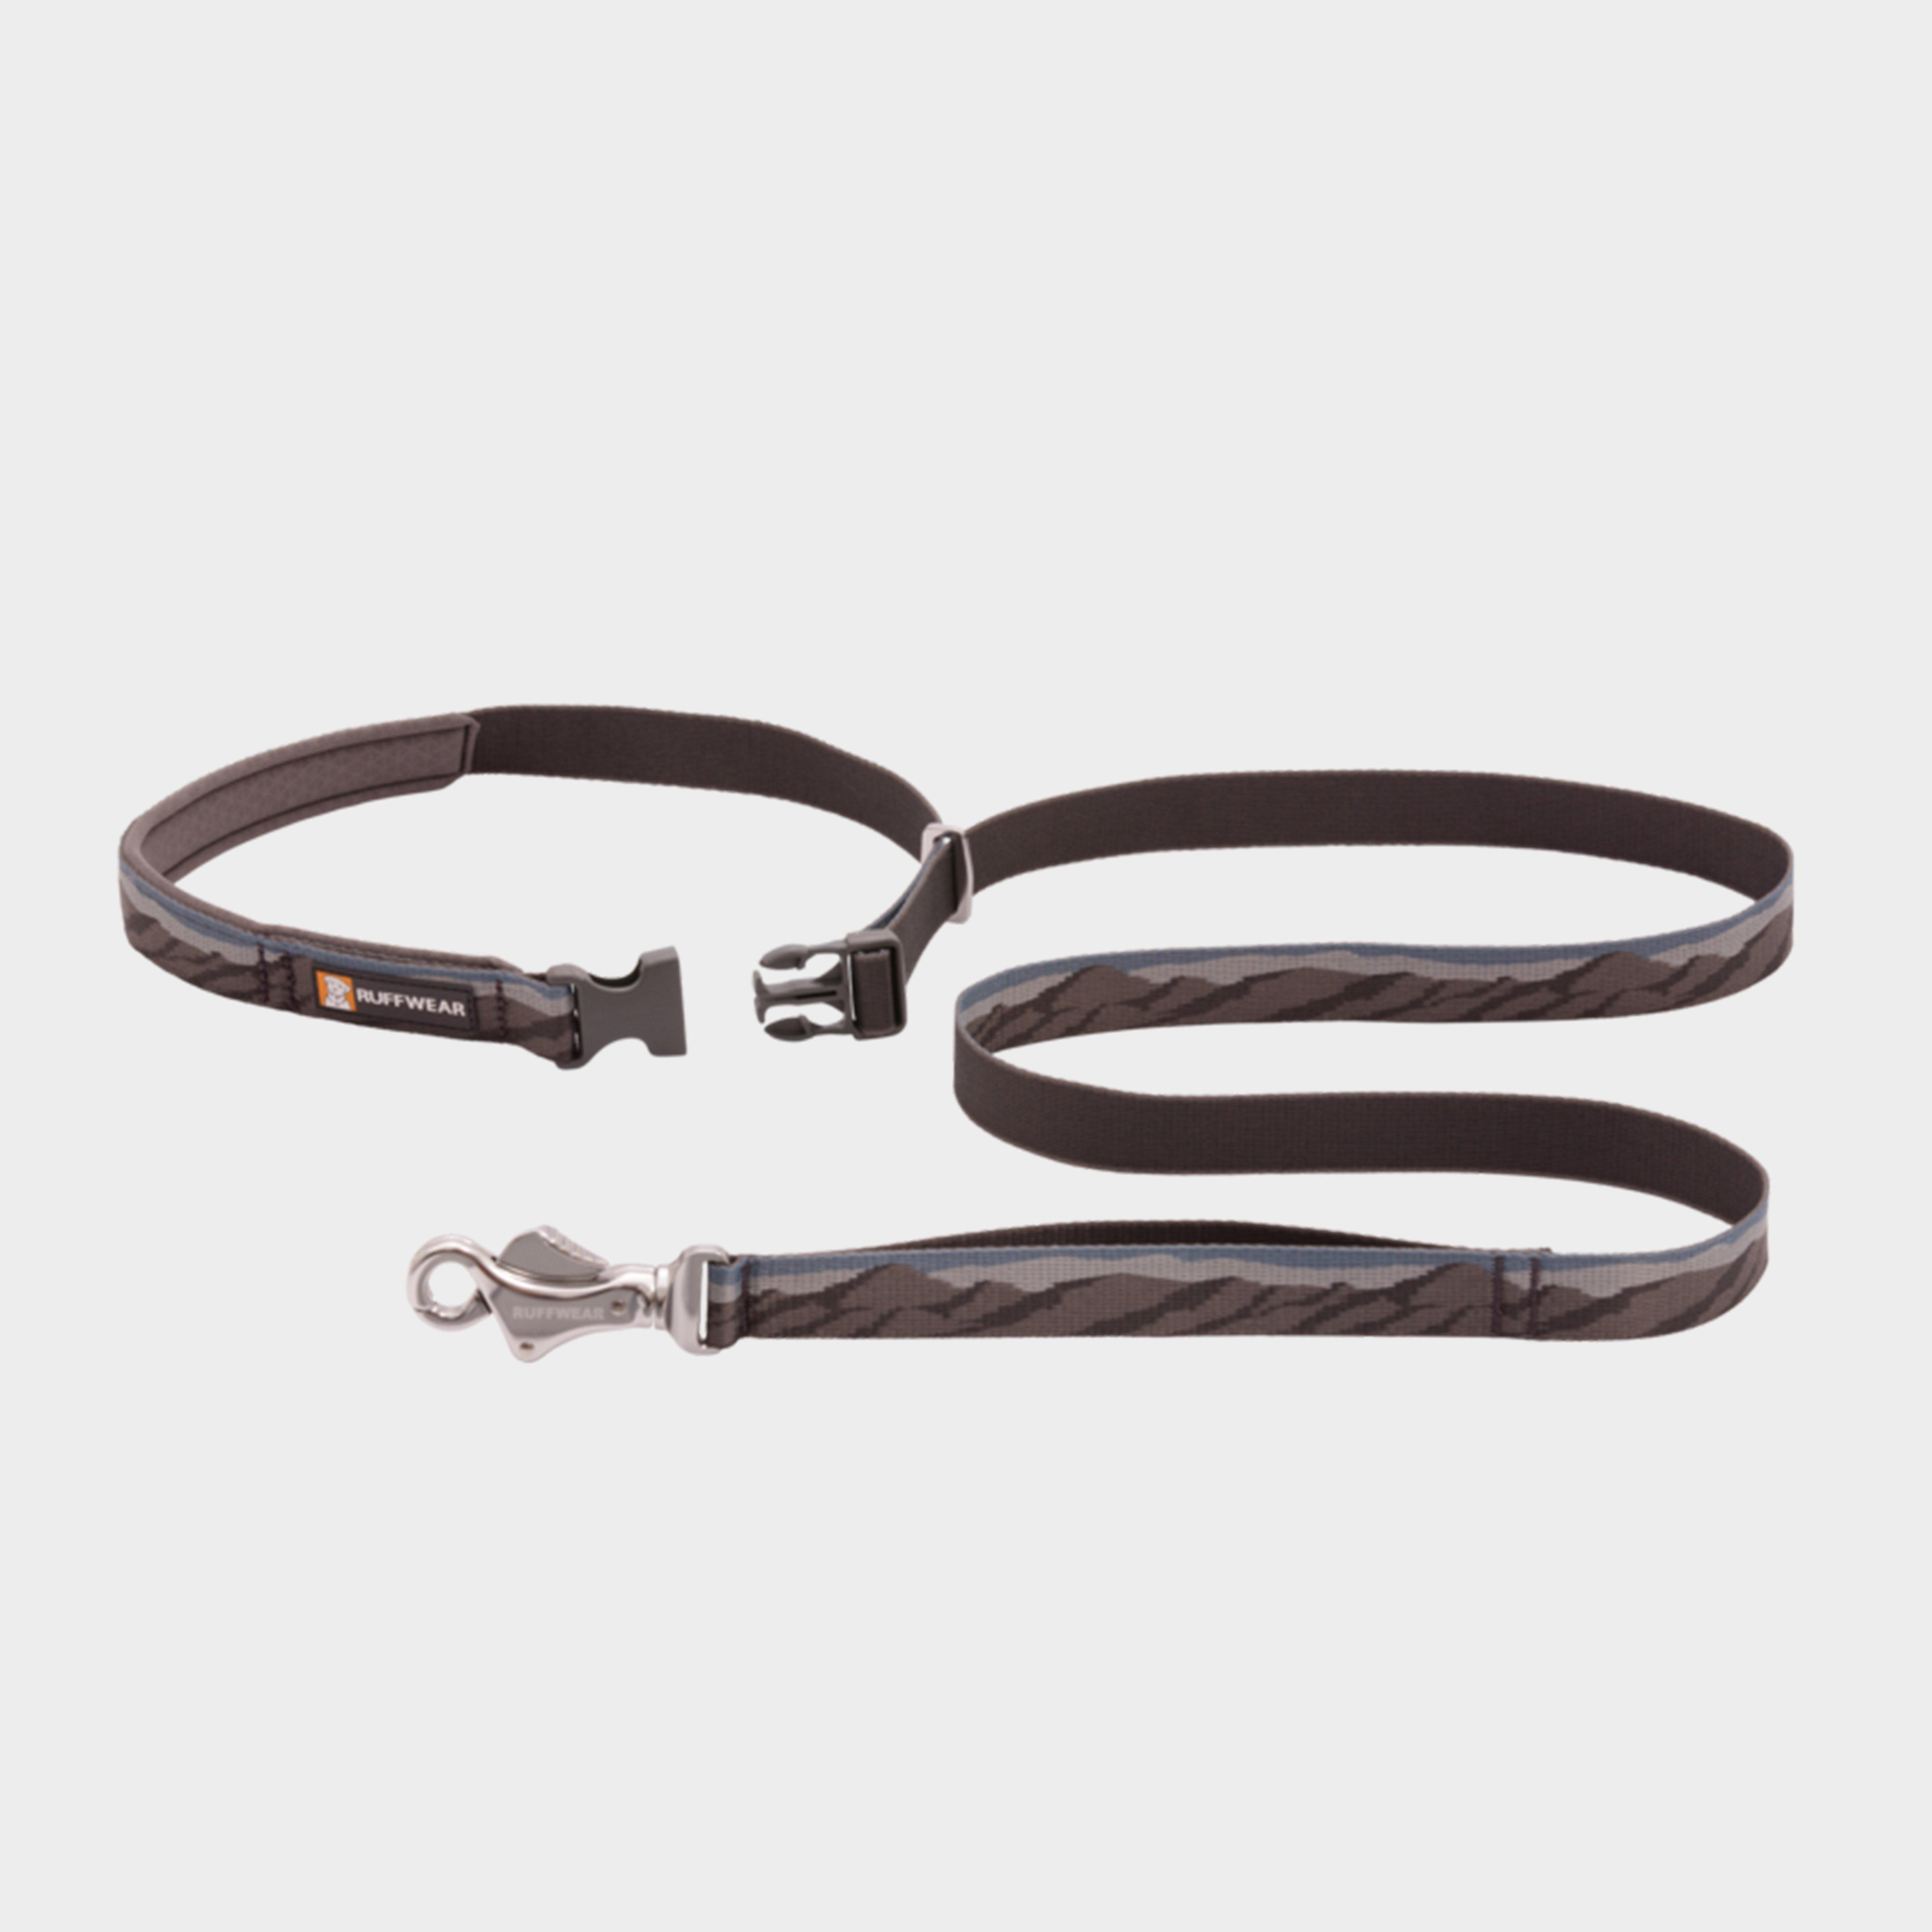 Image of Ruffwear Flat Out Adjustable Dog Lead - Grey/Rock, Grey/ROCK